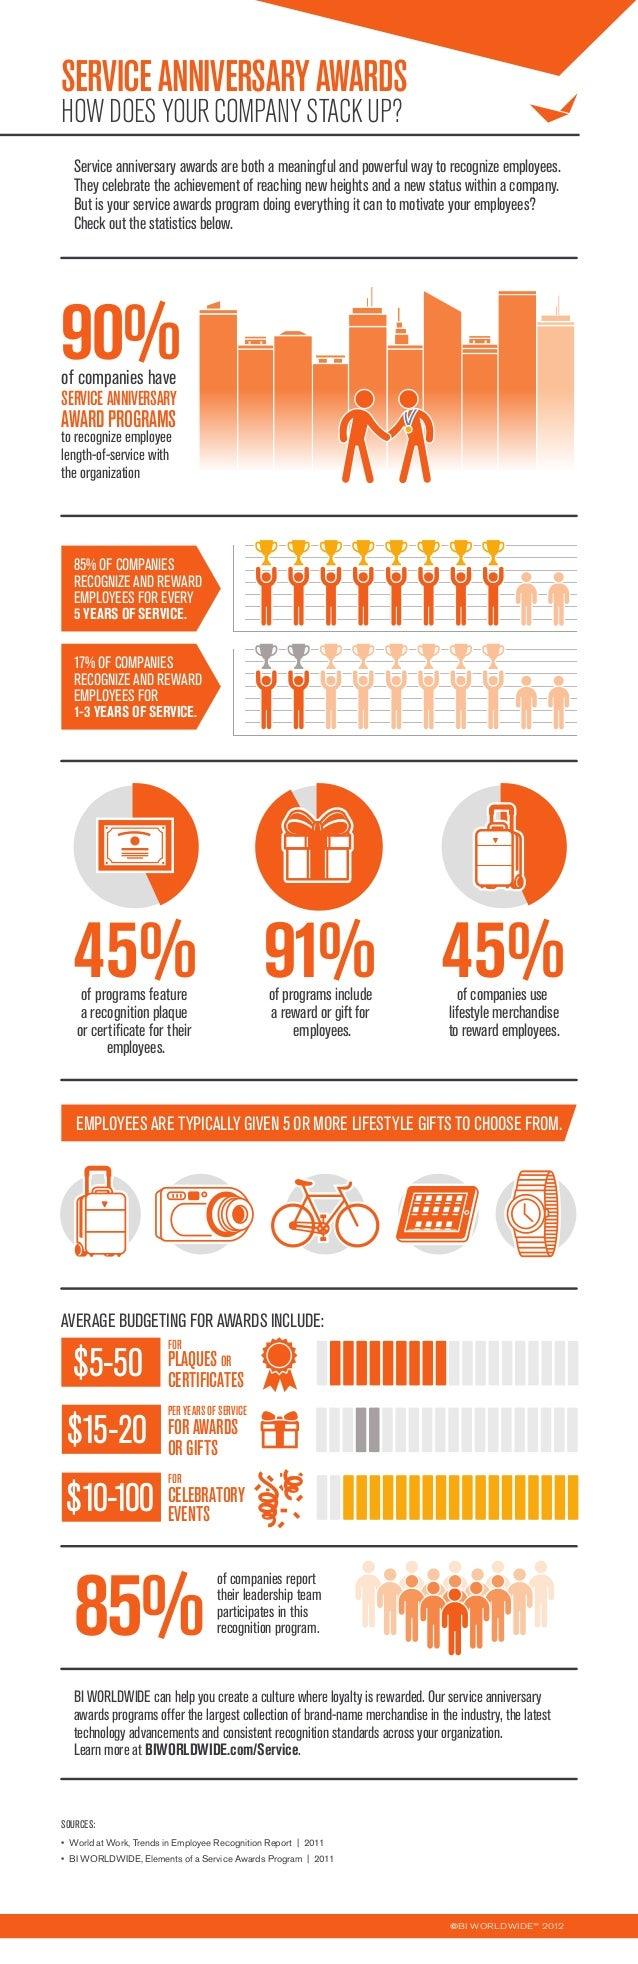 BI WORLDWIDE Service Awards Infographic